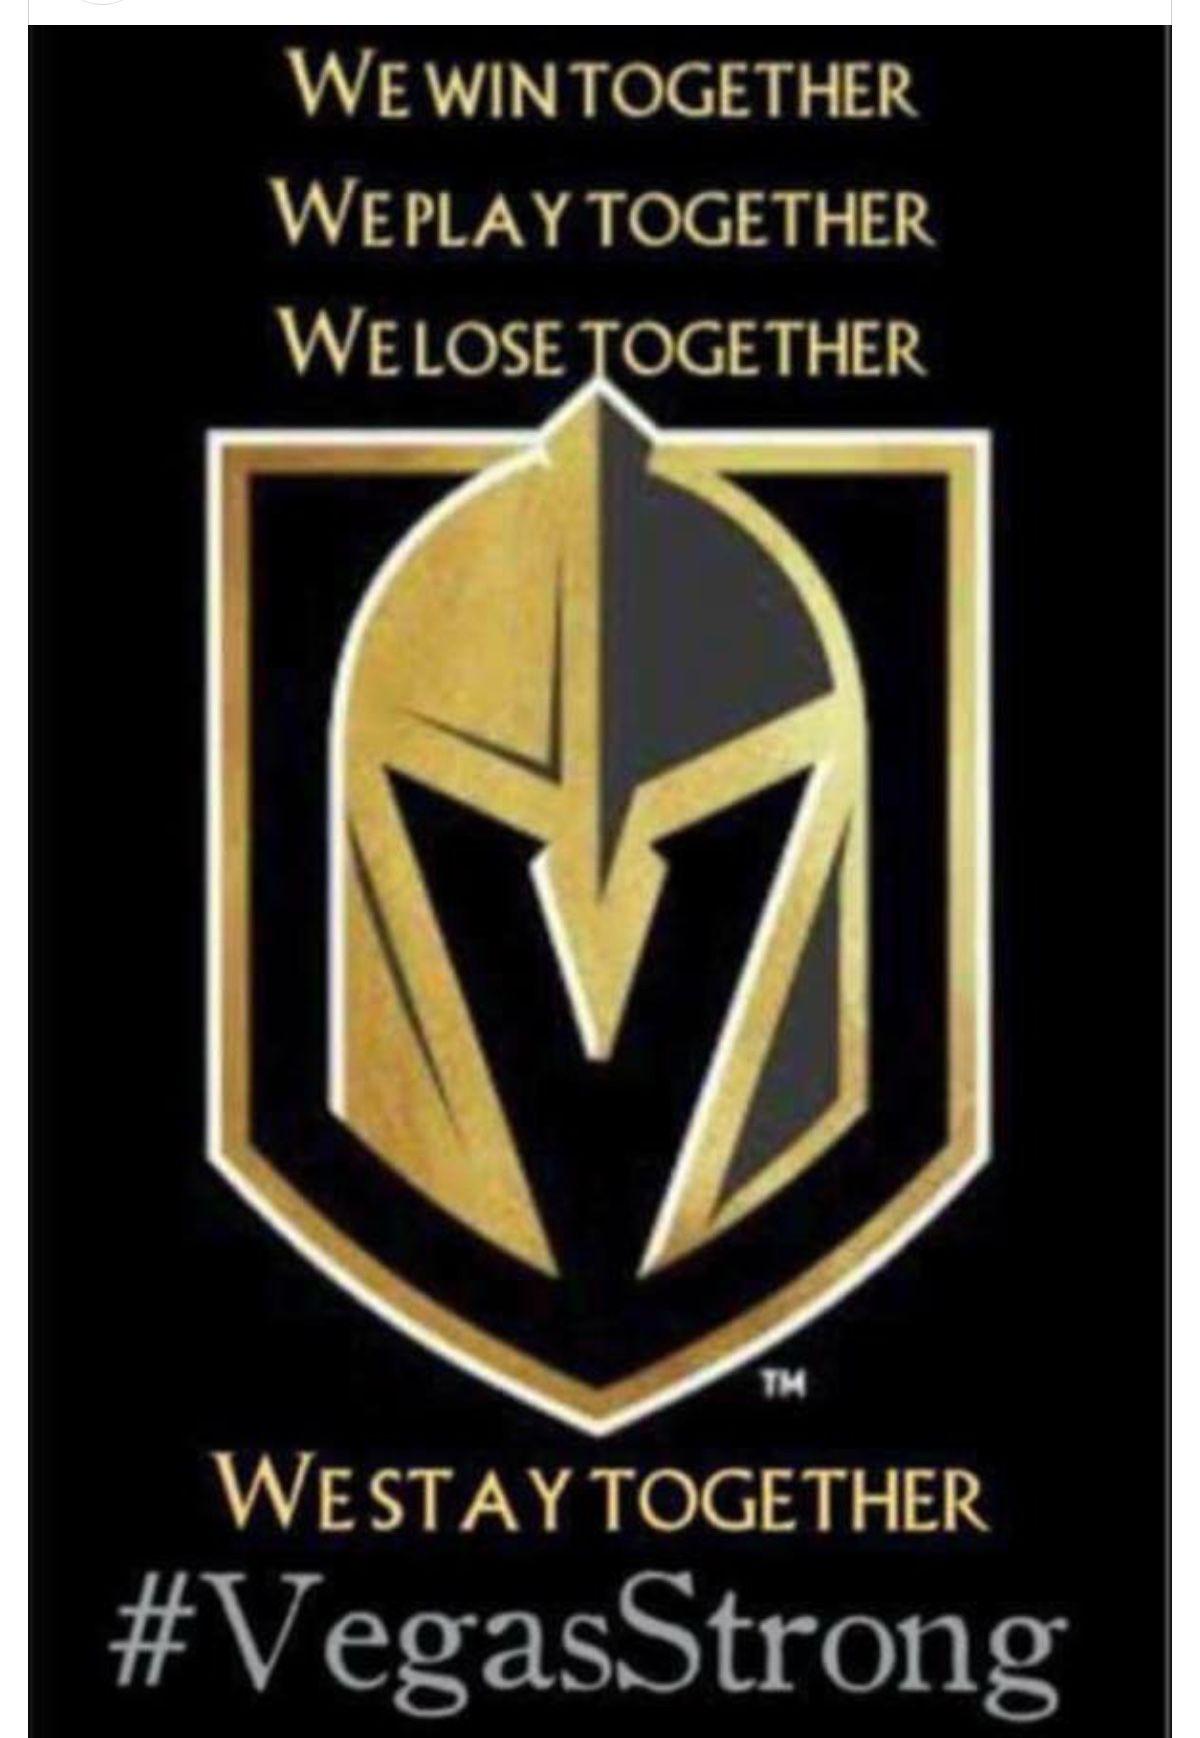 Pin By Bella Ann On Golden Knights 3 Vegas Golden Knights Golden Knights Hockey Golden Knights